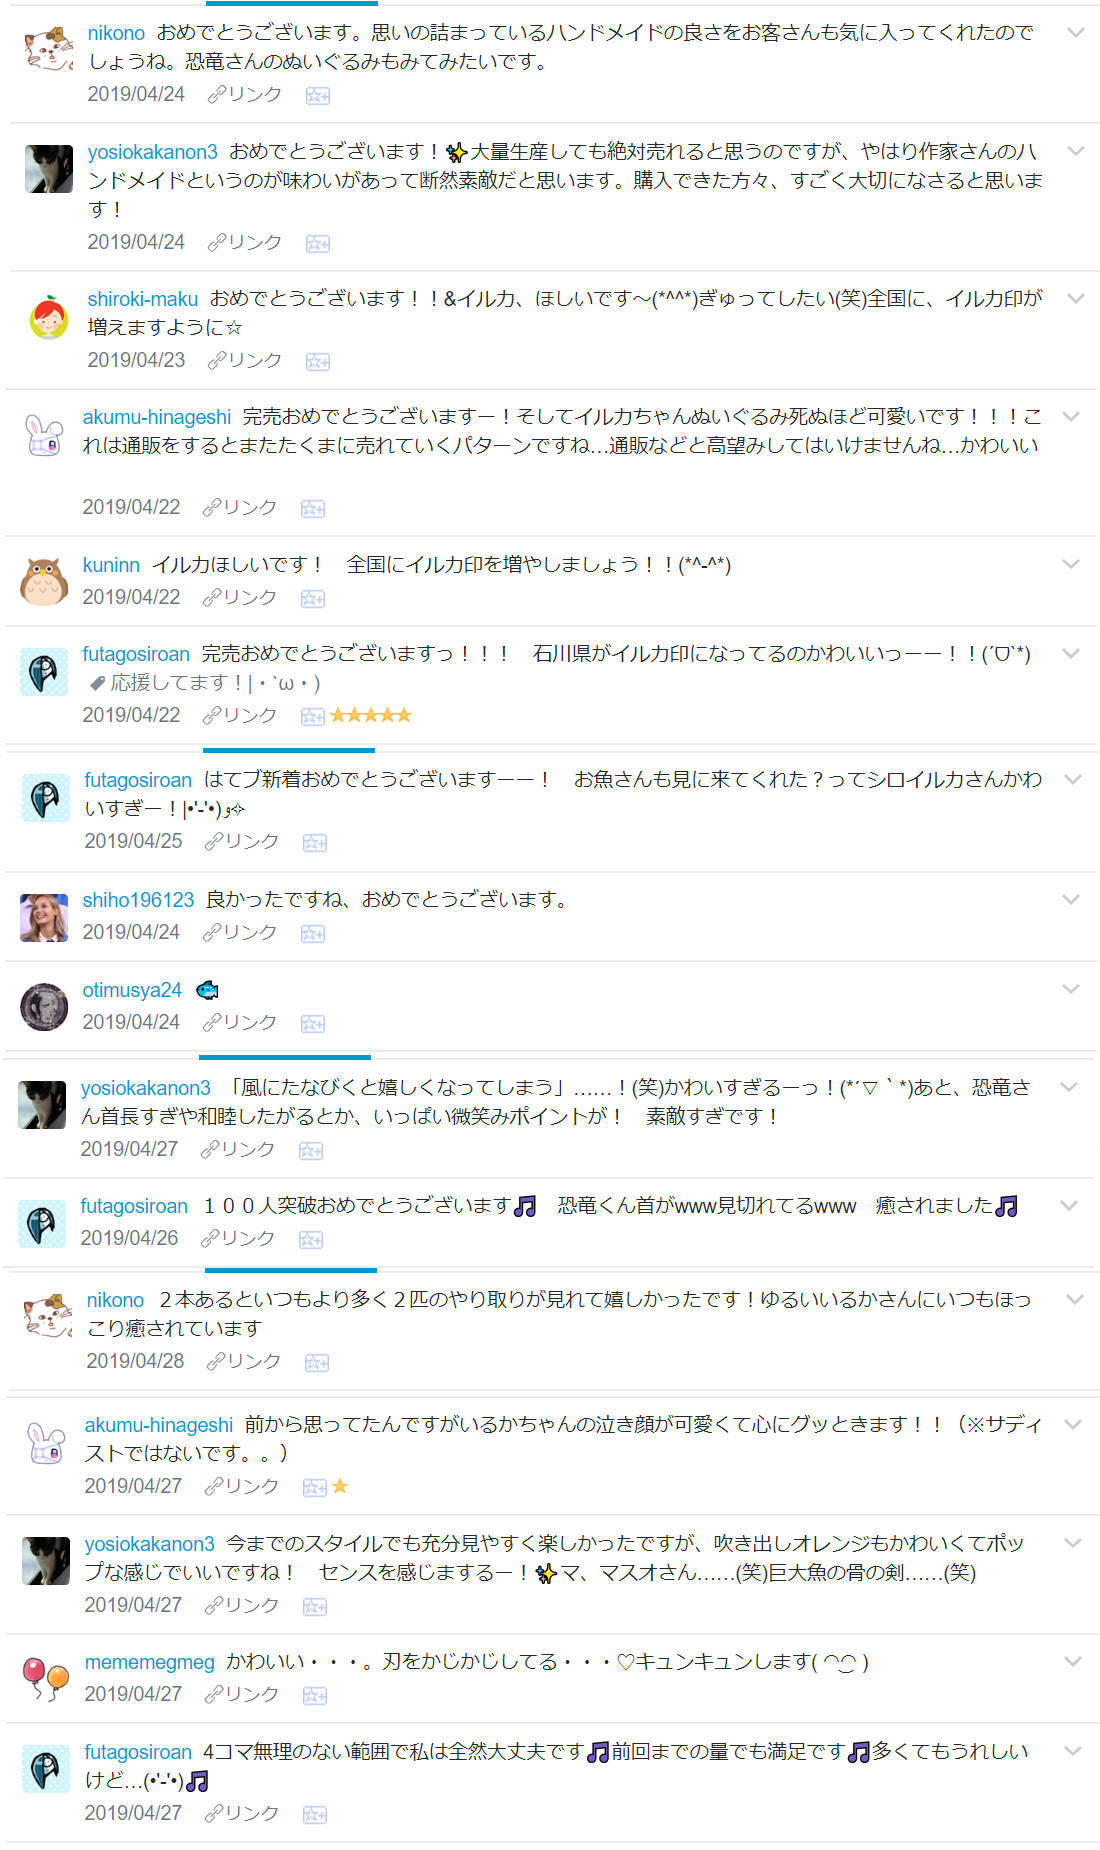 f:id:shiro_iruka:20190428133330j:plain